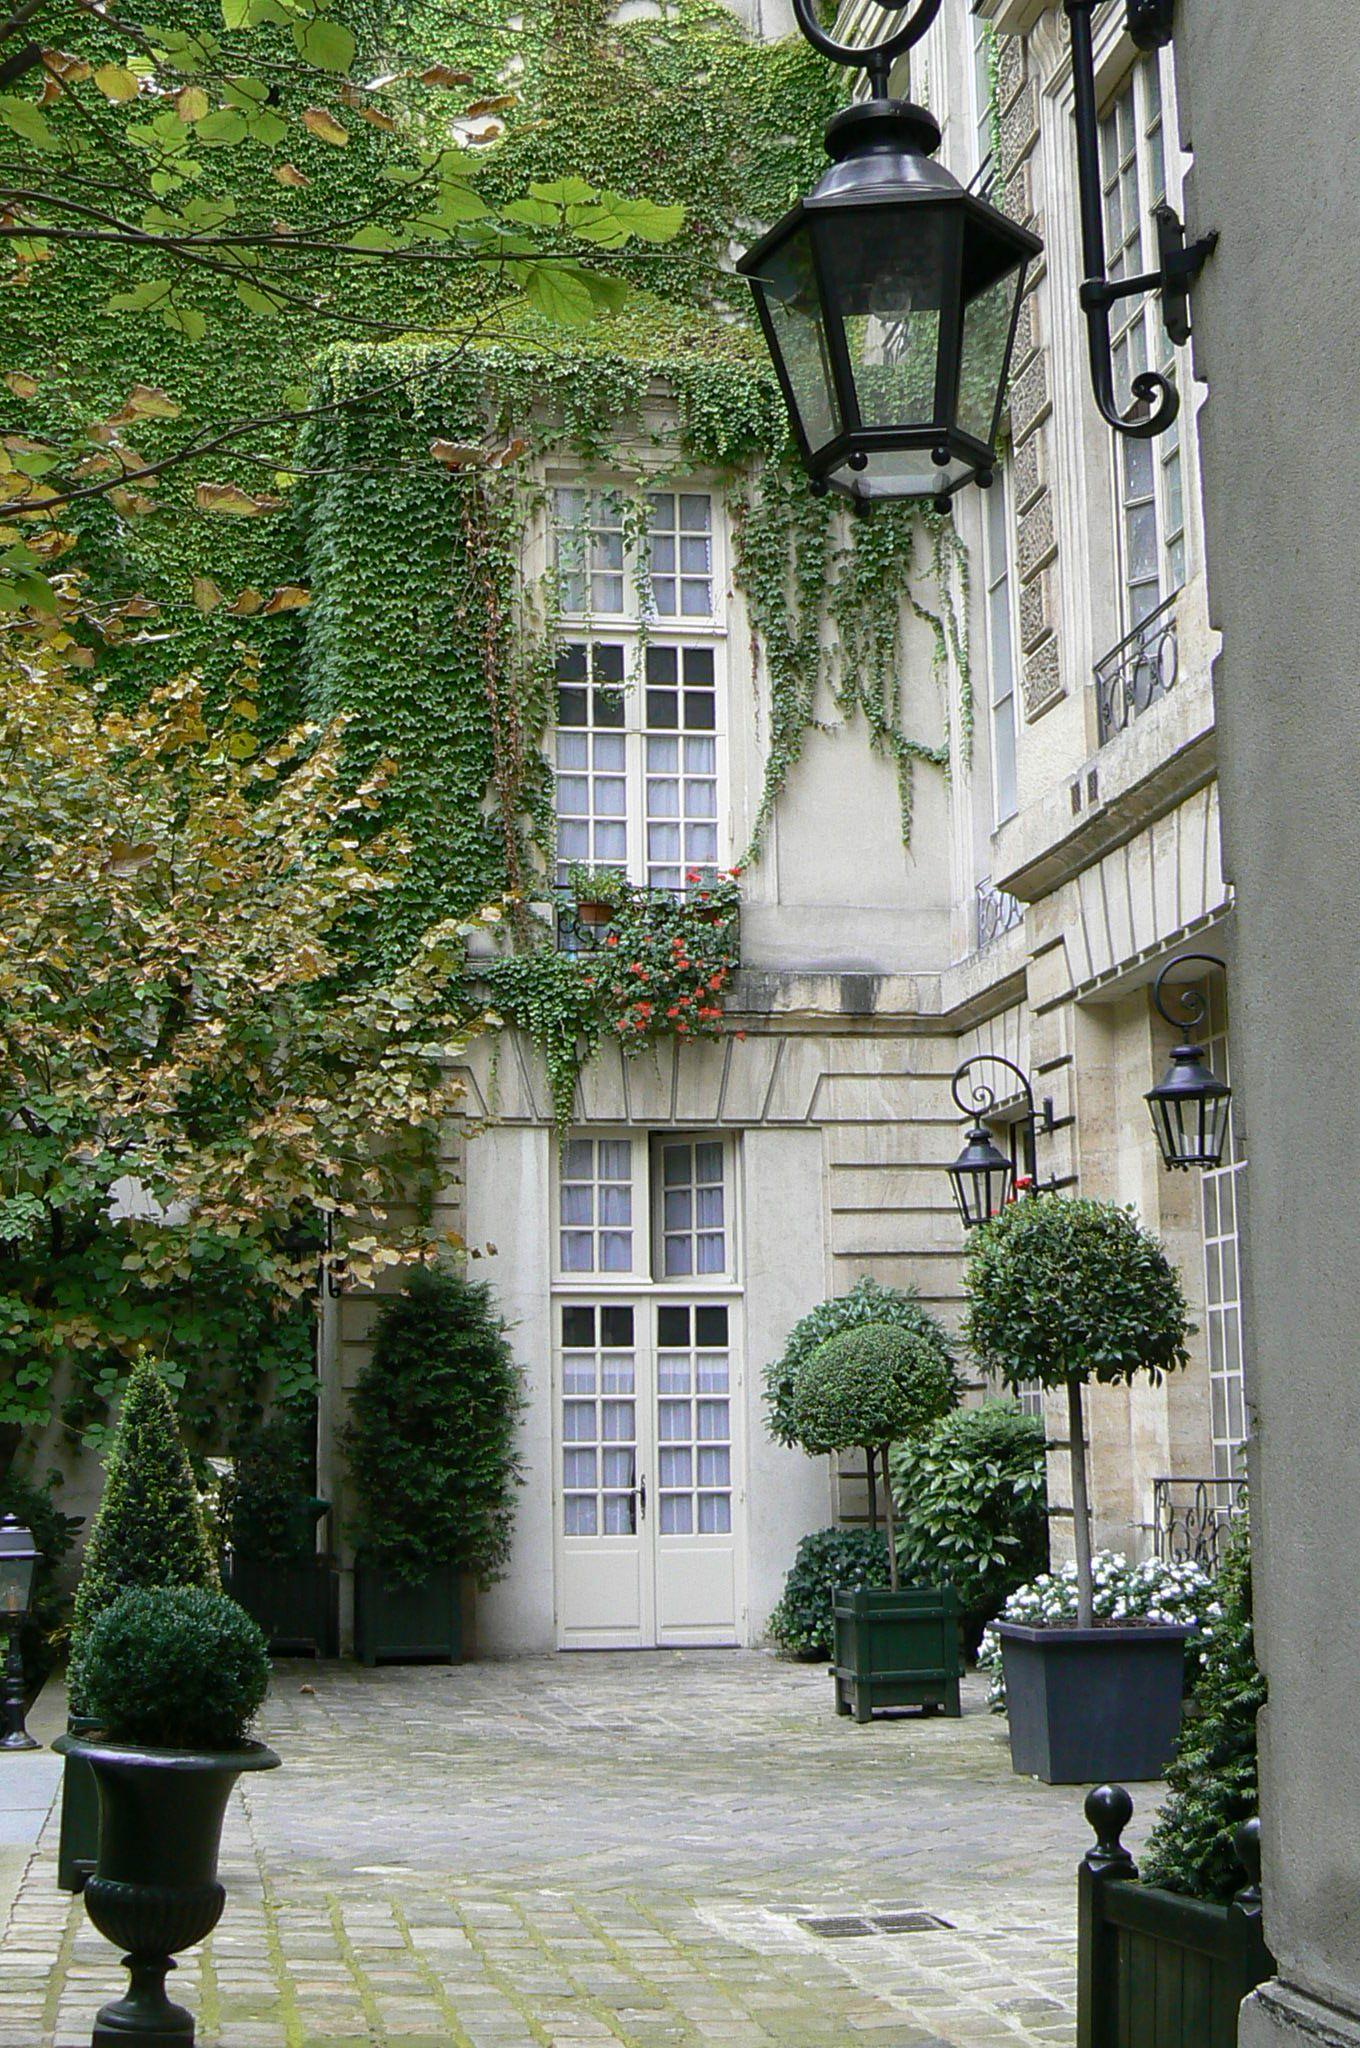 Jardin De Maison Best Of Courtyard Lanterns Of 58 Frais Jardin De Maison